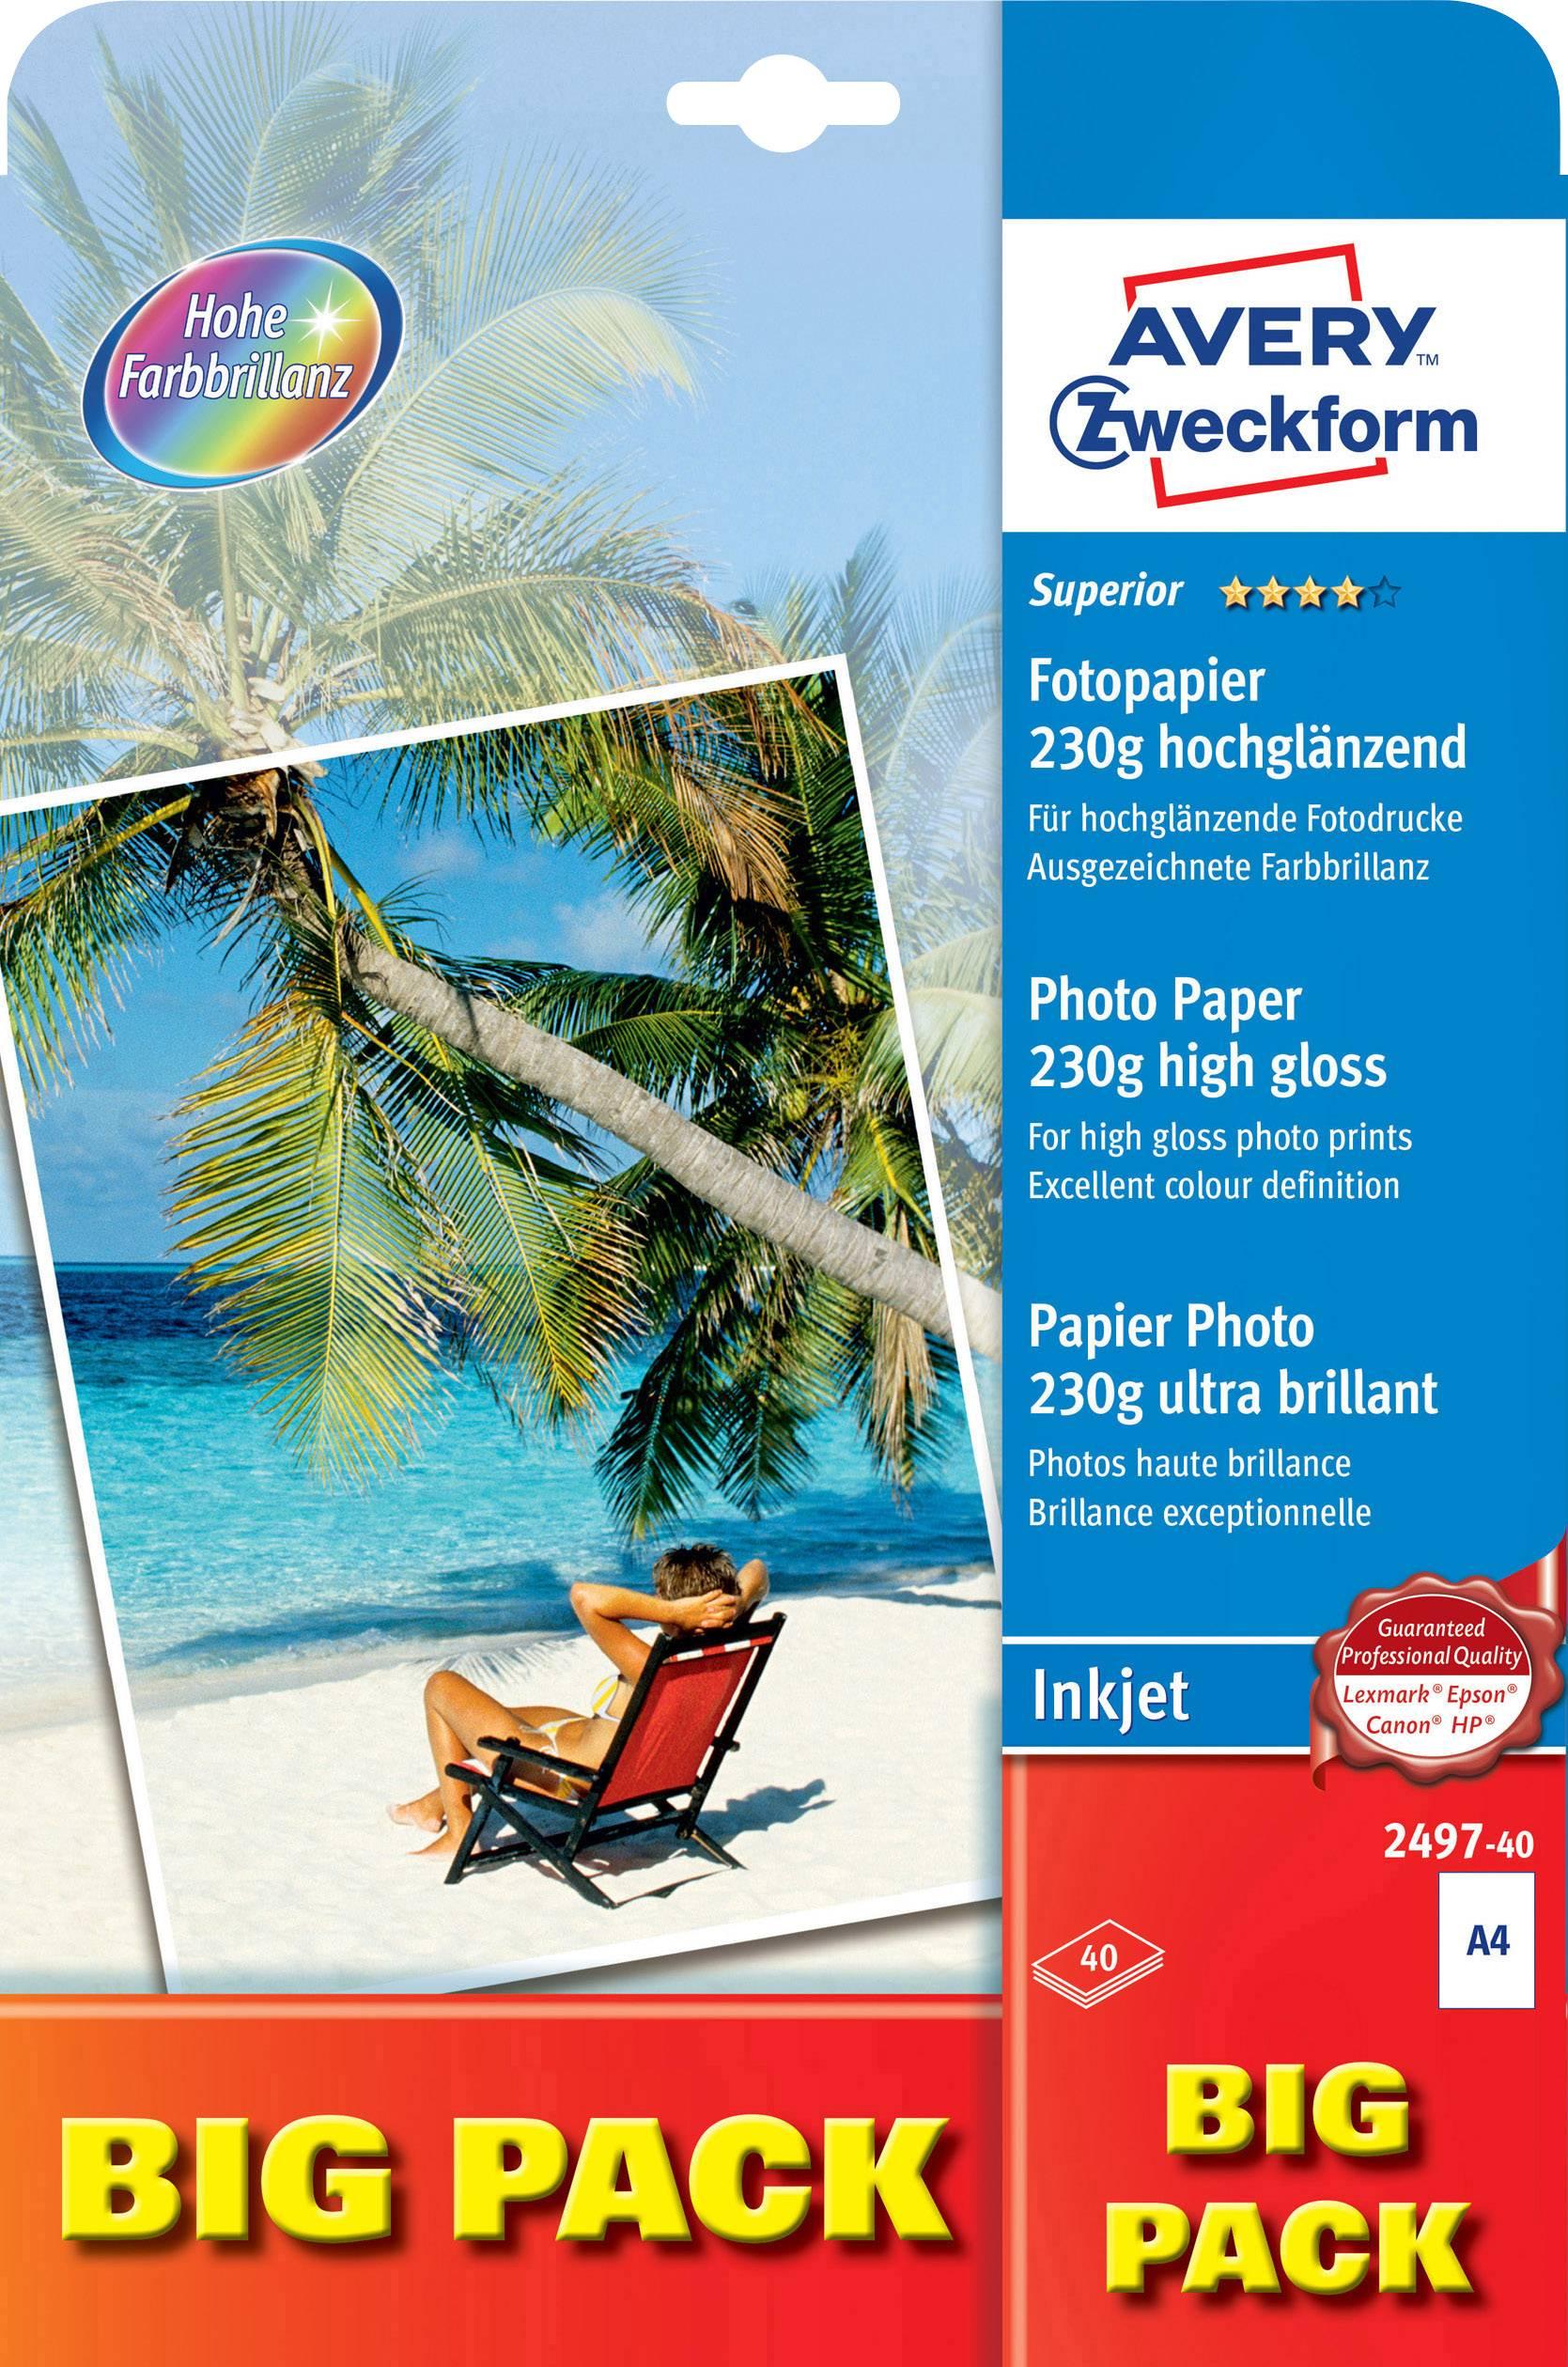 Fotografický papier Avery-Zweckform Superior Photo Paper Inkjet 2497-40, A4, 230 gm², 40 listov